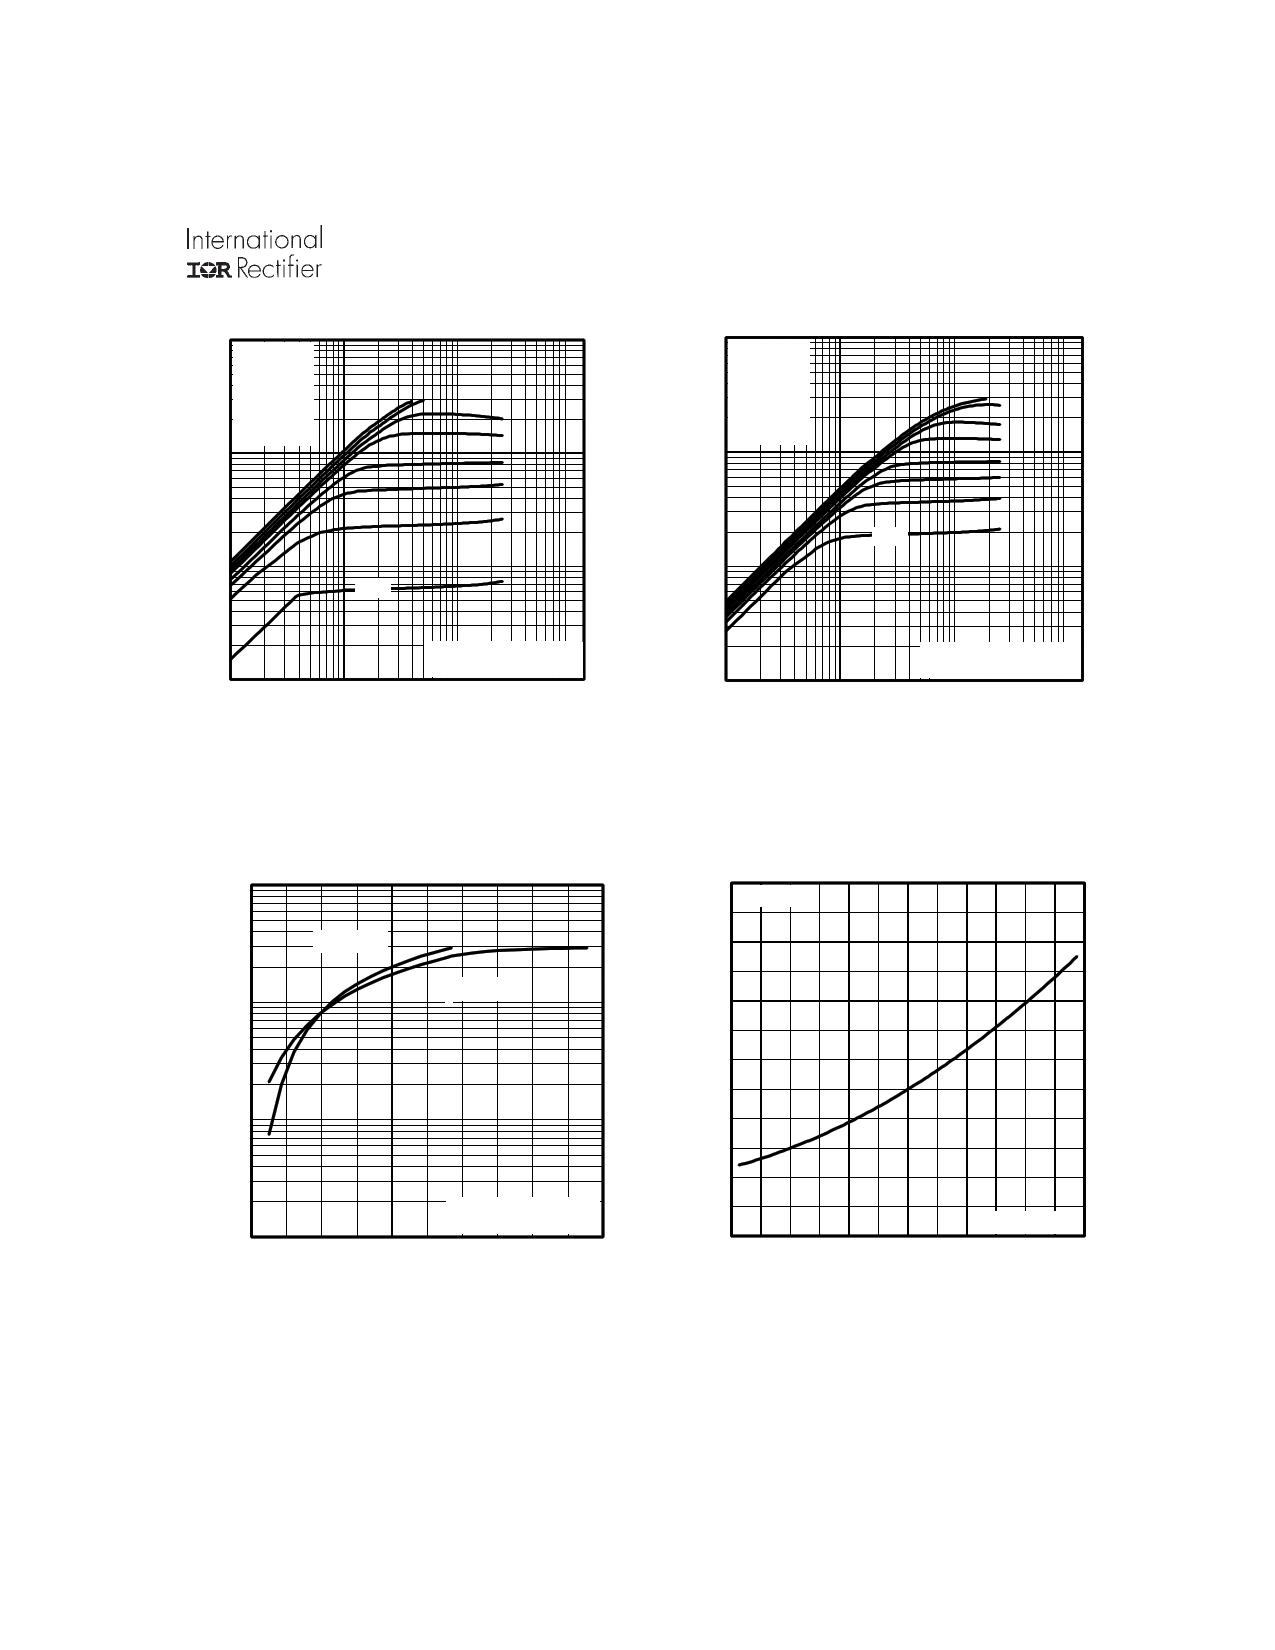 IRFZ48VSPBF pdf, ピン配列